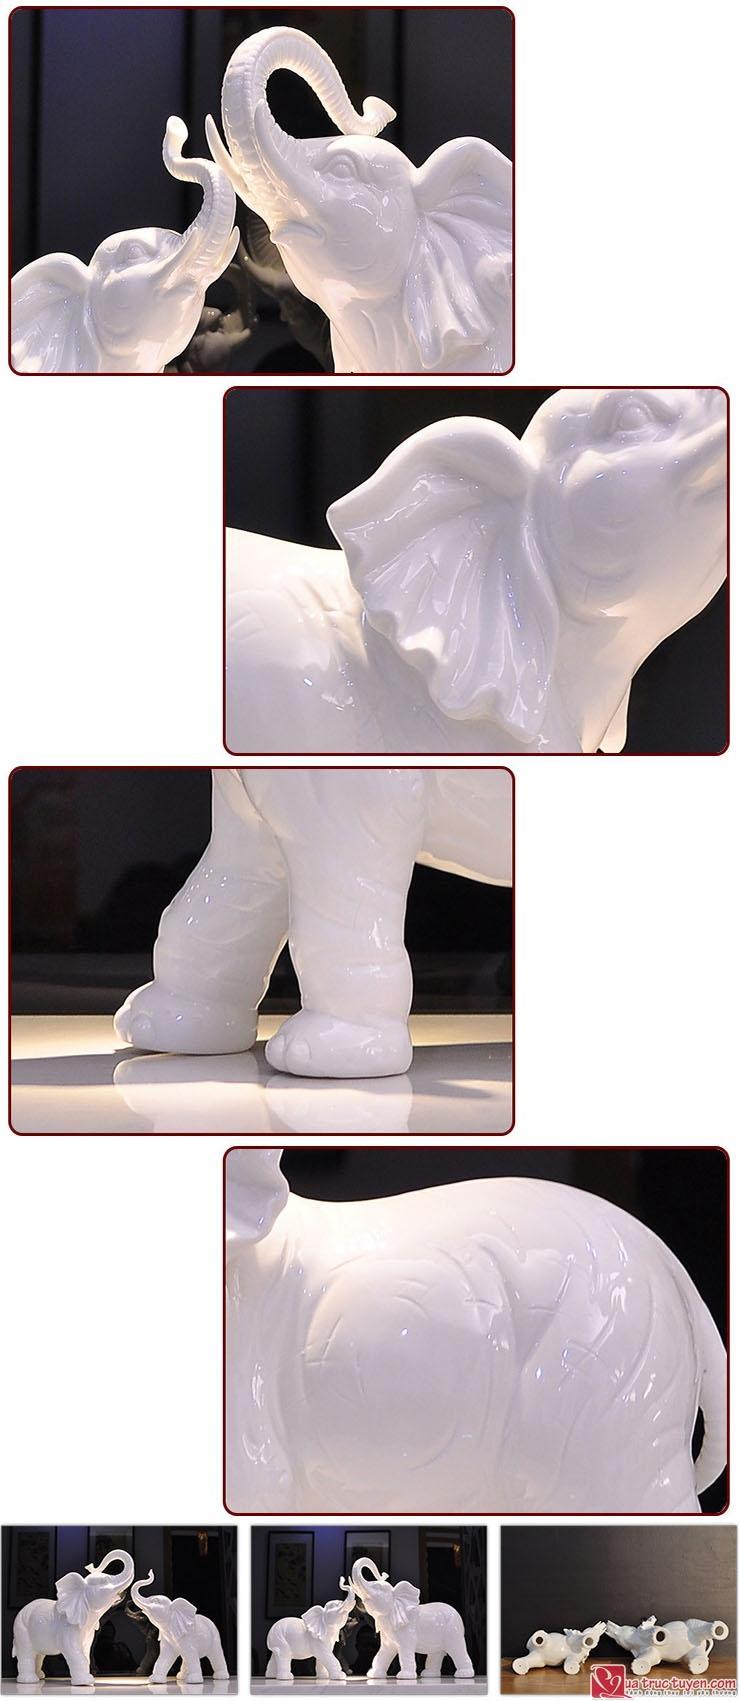 doi-voi-phong-thuy-loai-lon-04